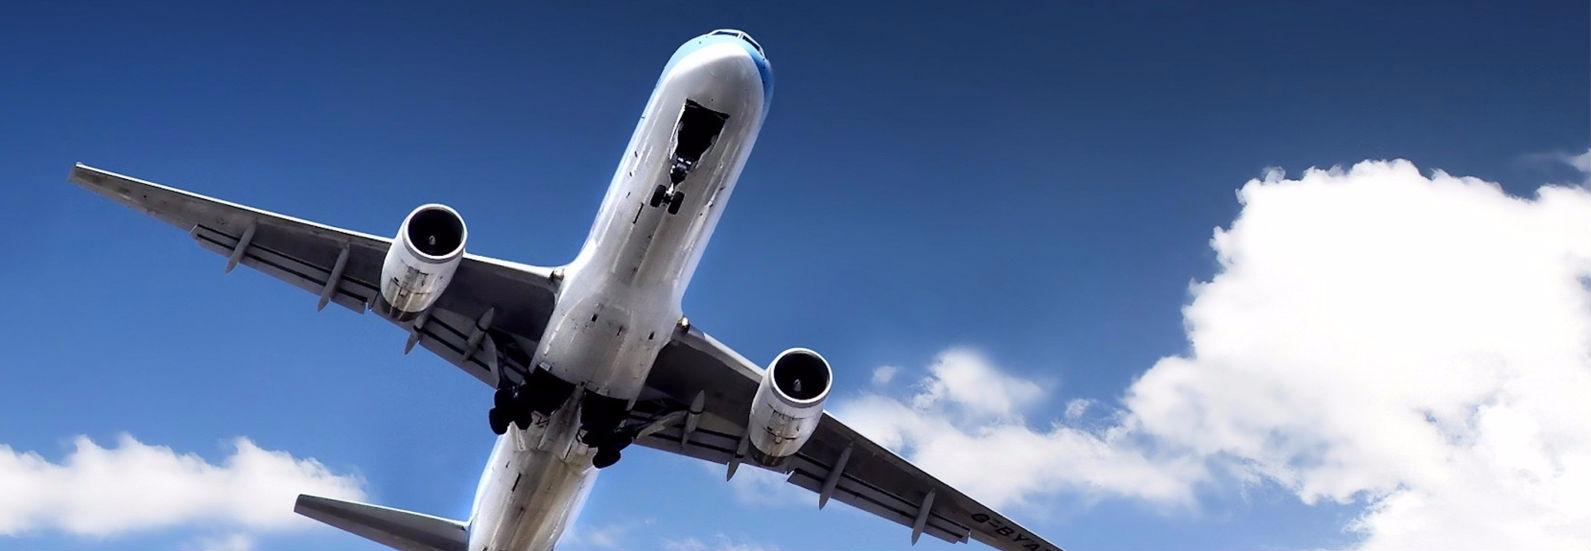 Aeropuerto de Madrid Barajas (@aeropuertodemadrid) Cover Image